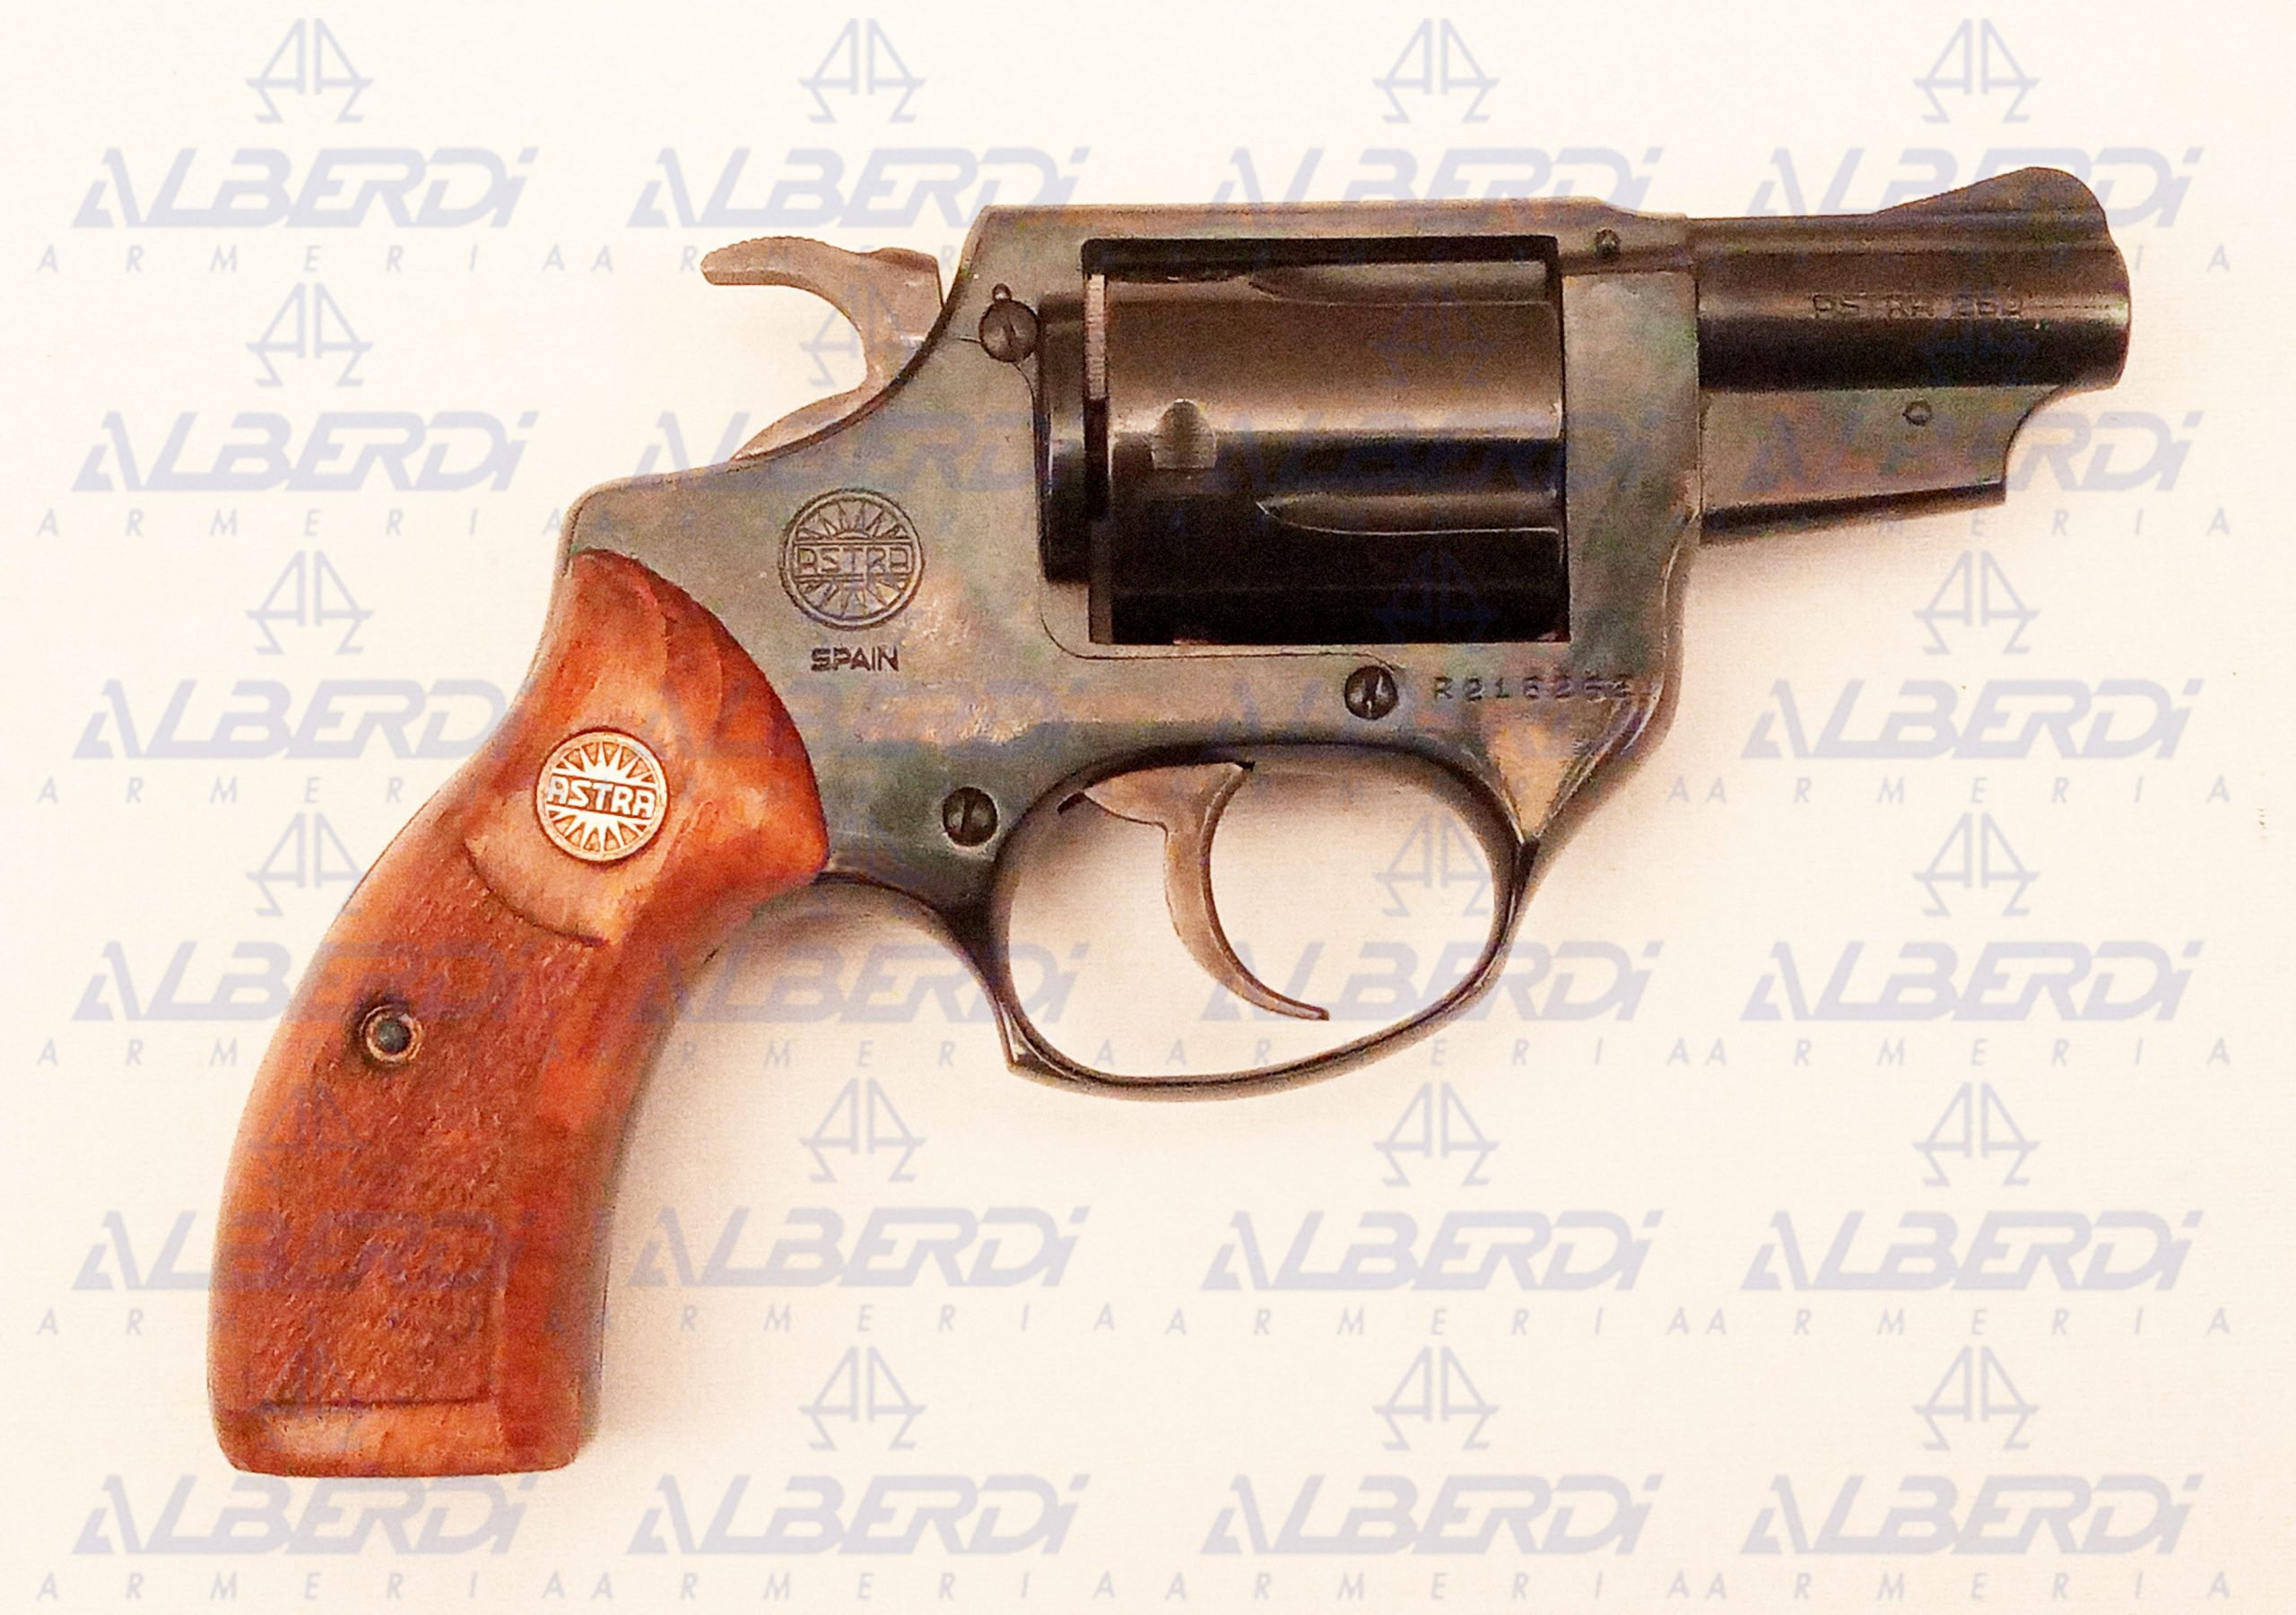 ASTRA Revolver Mod 250 cal 38 Sp nº R218262-1 B Agua